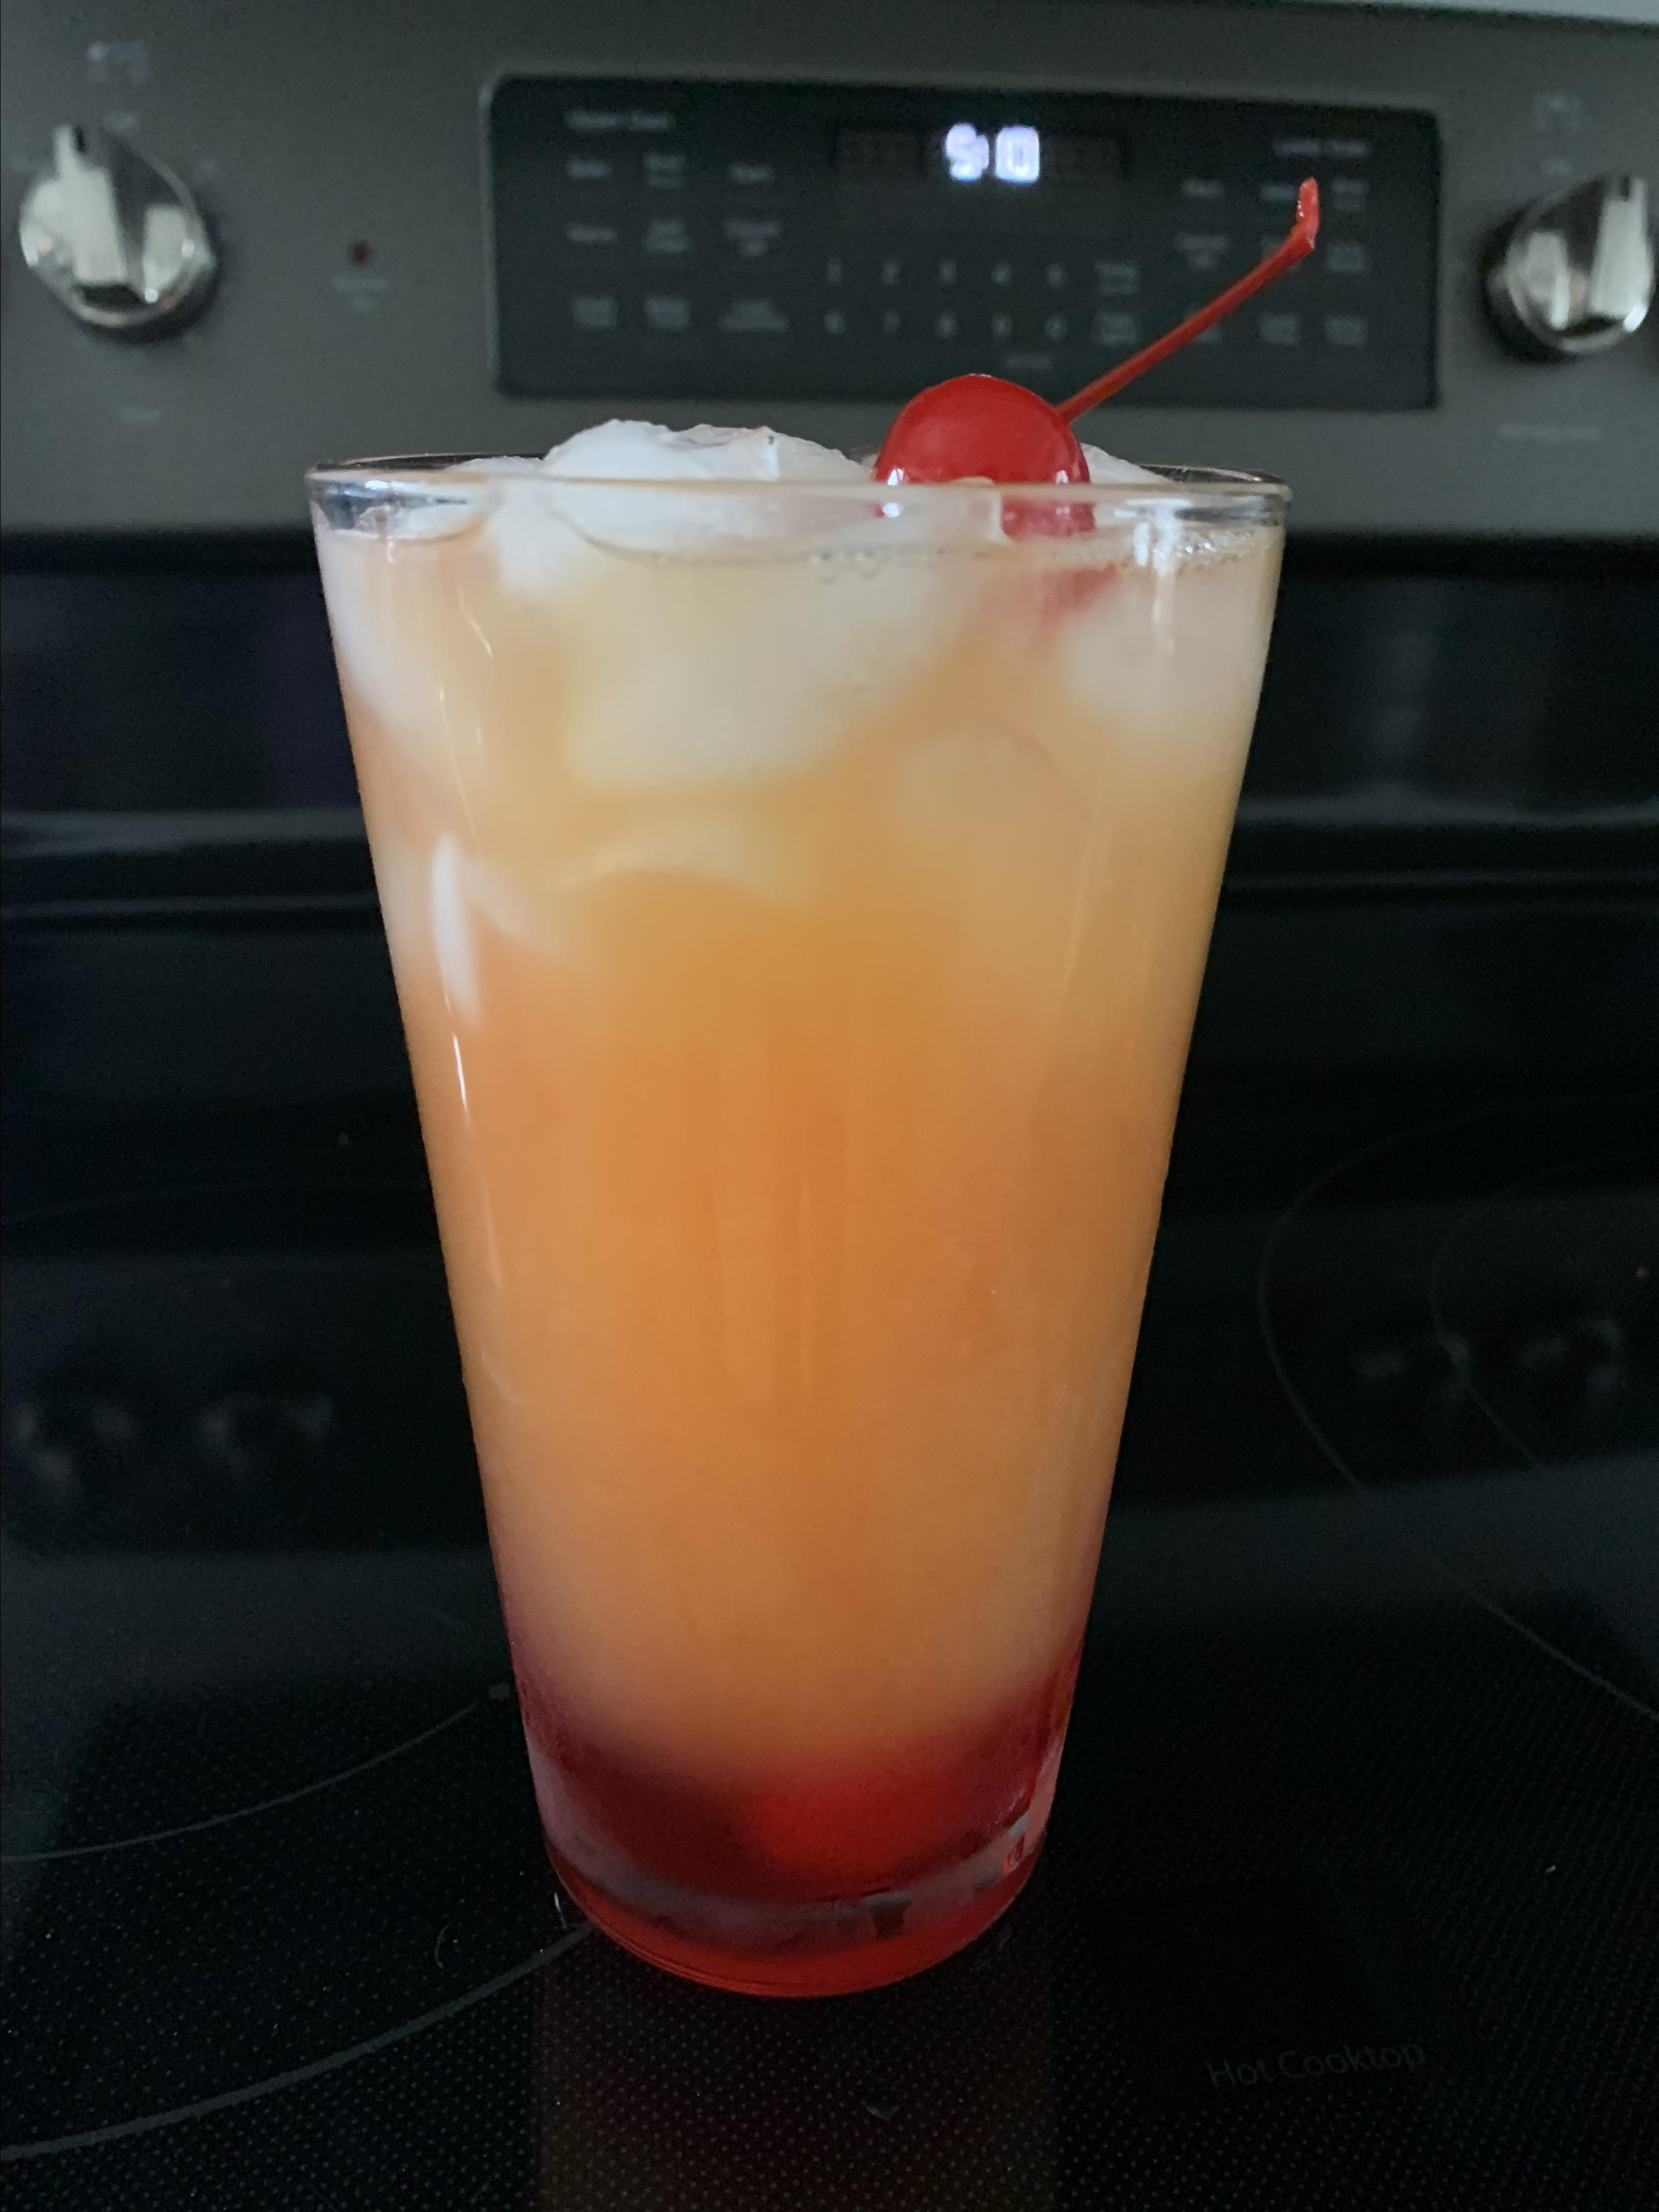 Pineapple Upside-Down Cake in a Glass emilyhaycraft